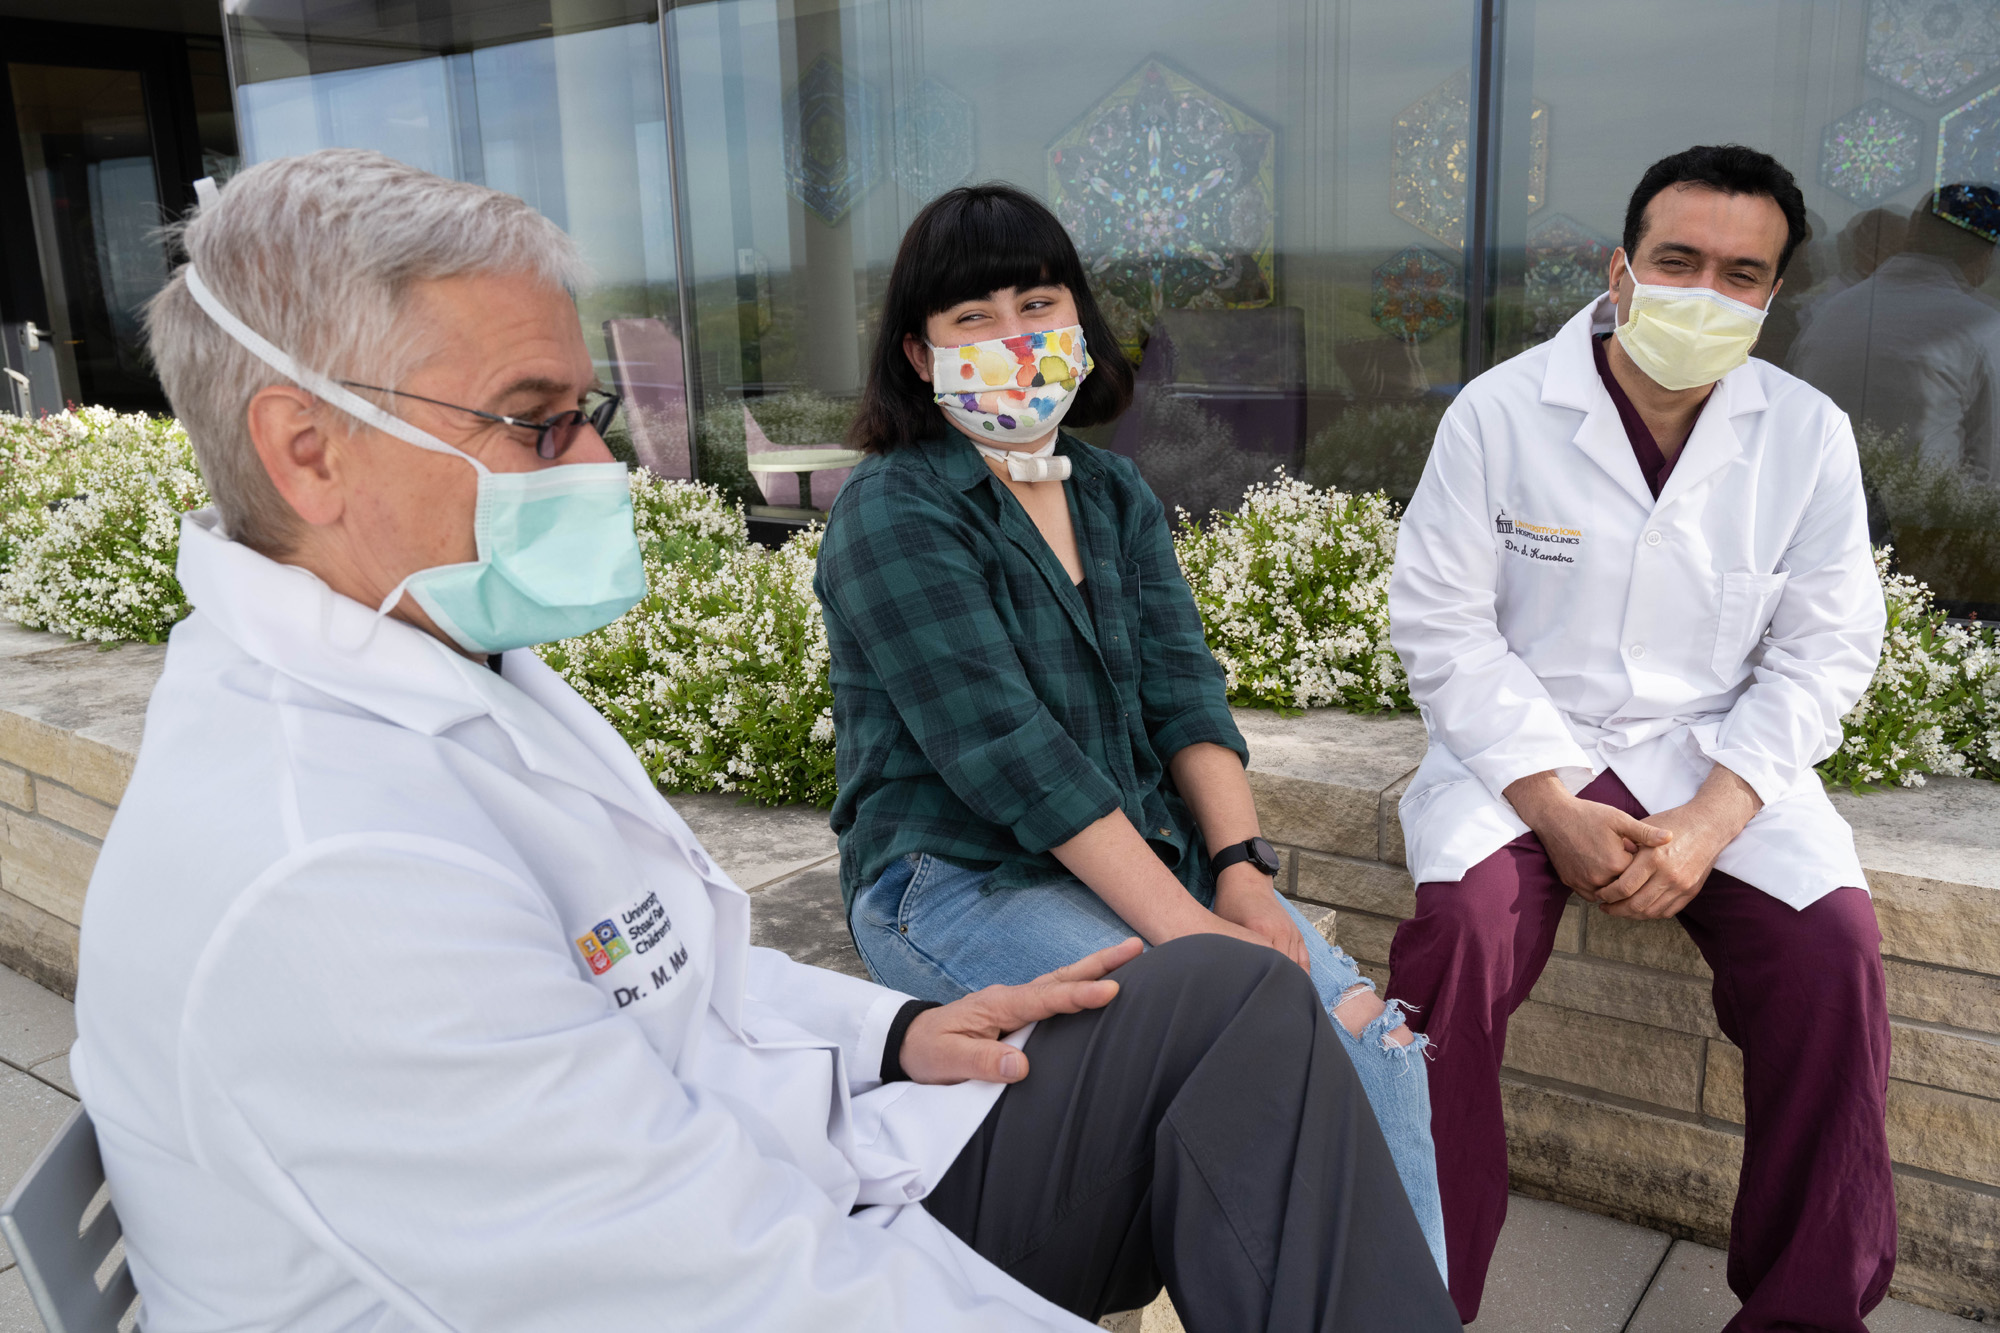 Nina Alvarez wih otolaryngologist Sohit Kanotra (right) and anesthesiologist Martin Mueller (left)